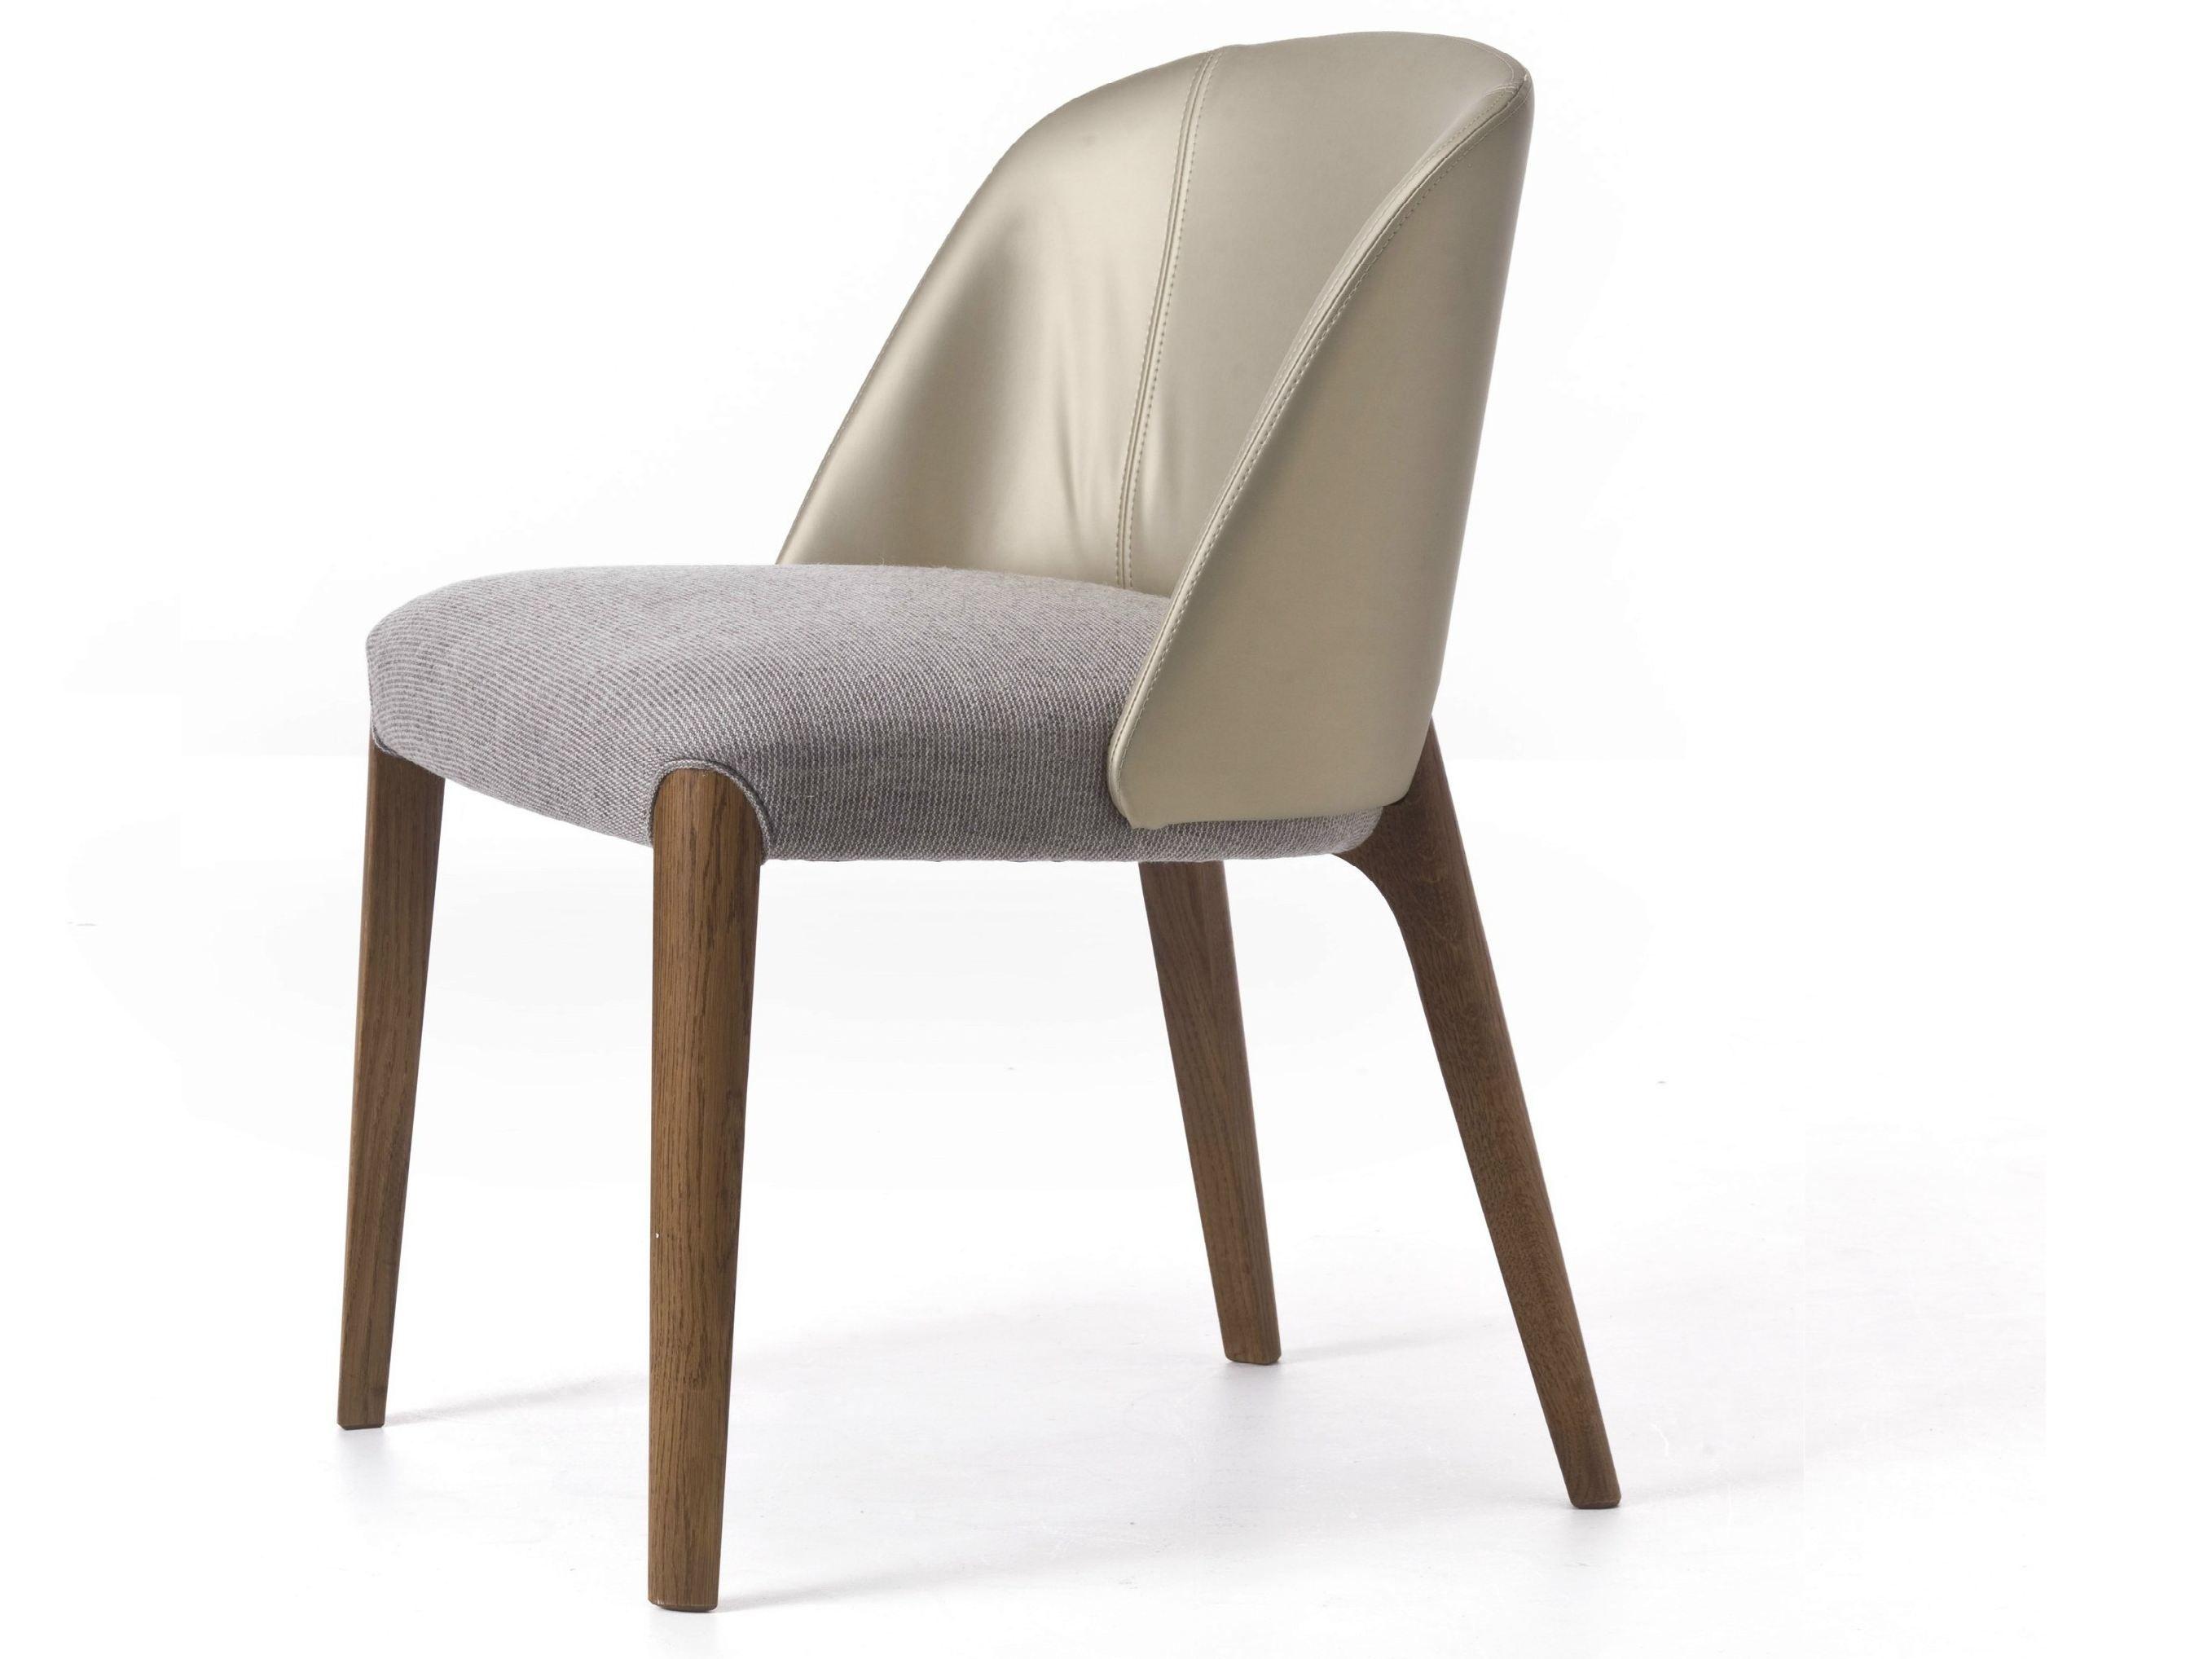 bellevue 01 by very wood design this weber. Black Bedroom Furniture Sets. Home Design Ideas